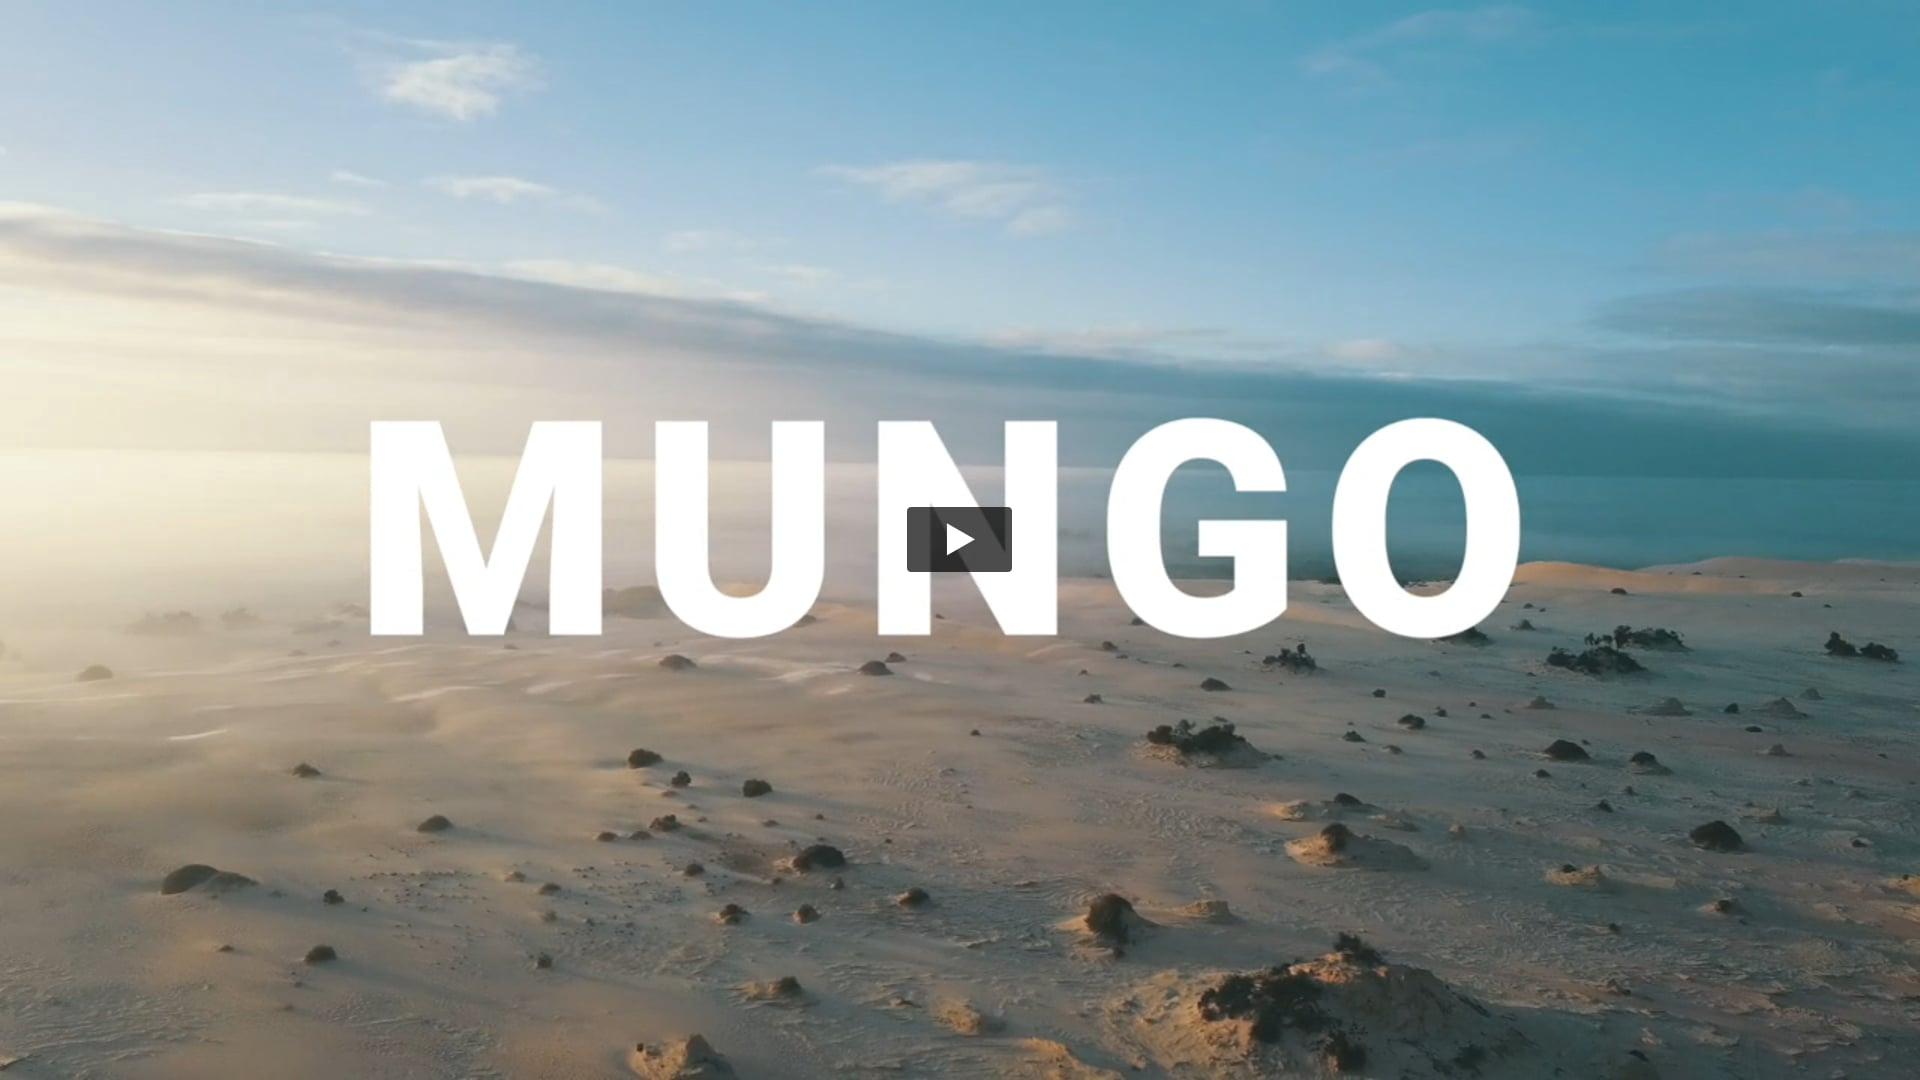 Mungo Fly Around